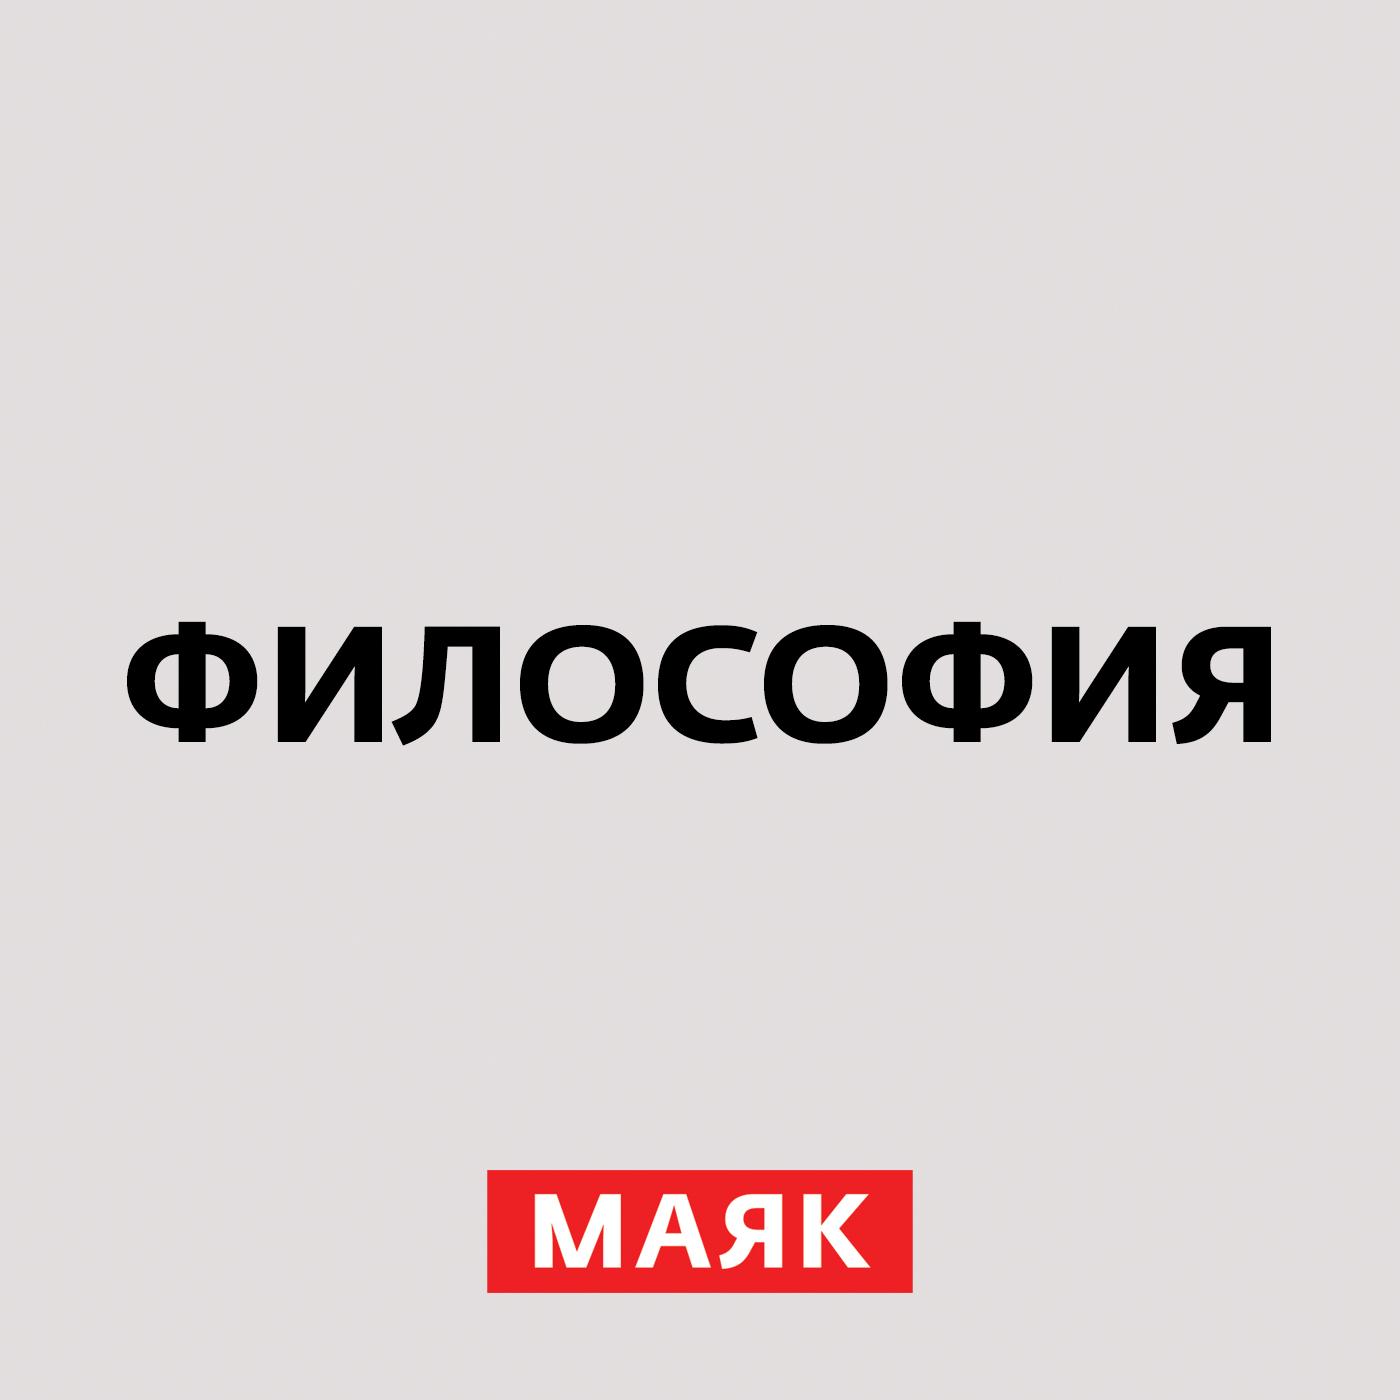 Творческий коллектив шоу «Объект 22» Философия Фридриха Шеллинга творческий коллектив шоу объект 22 фрэнсис бэкон